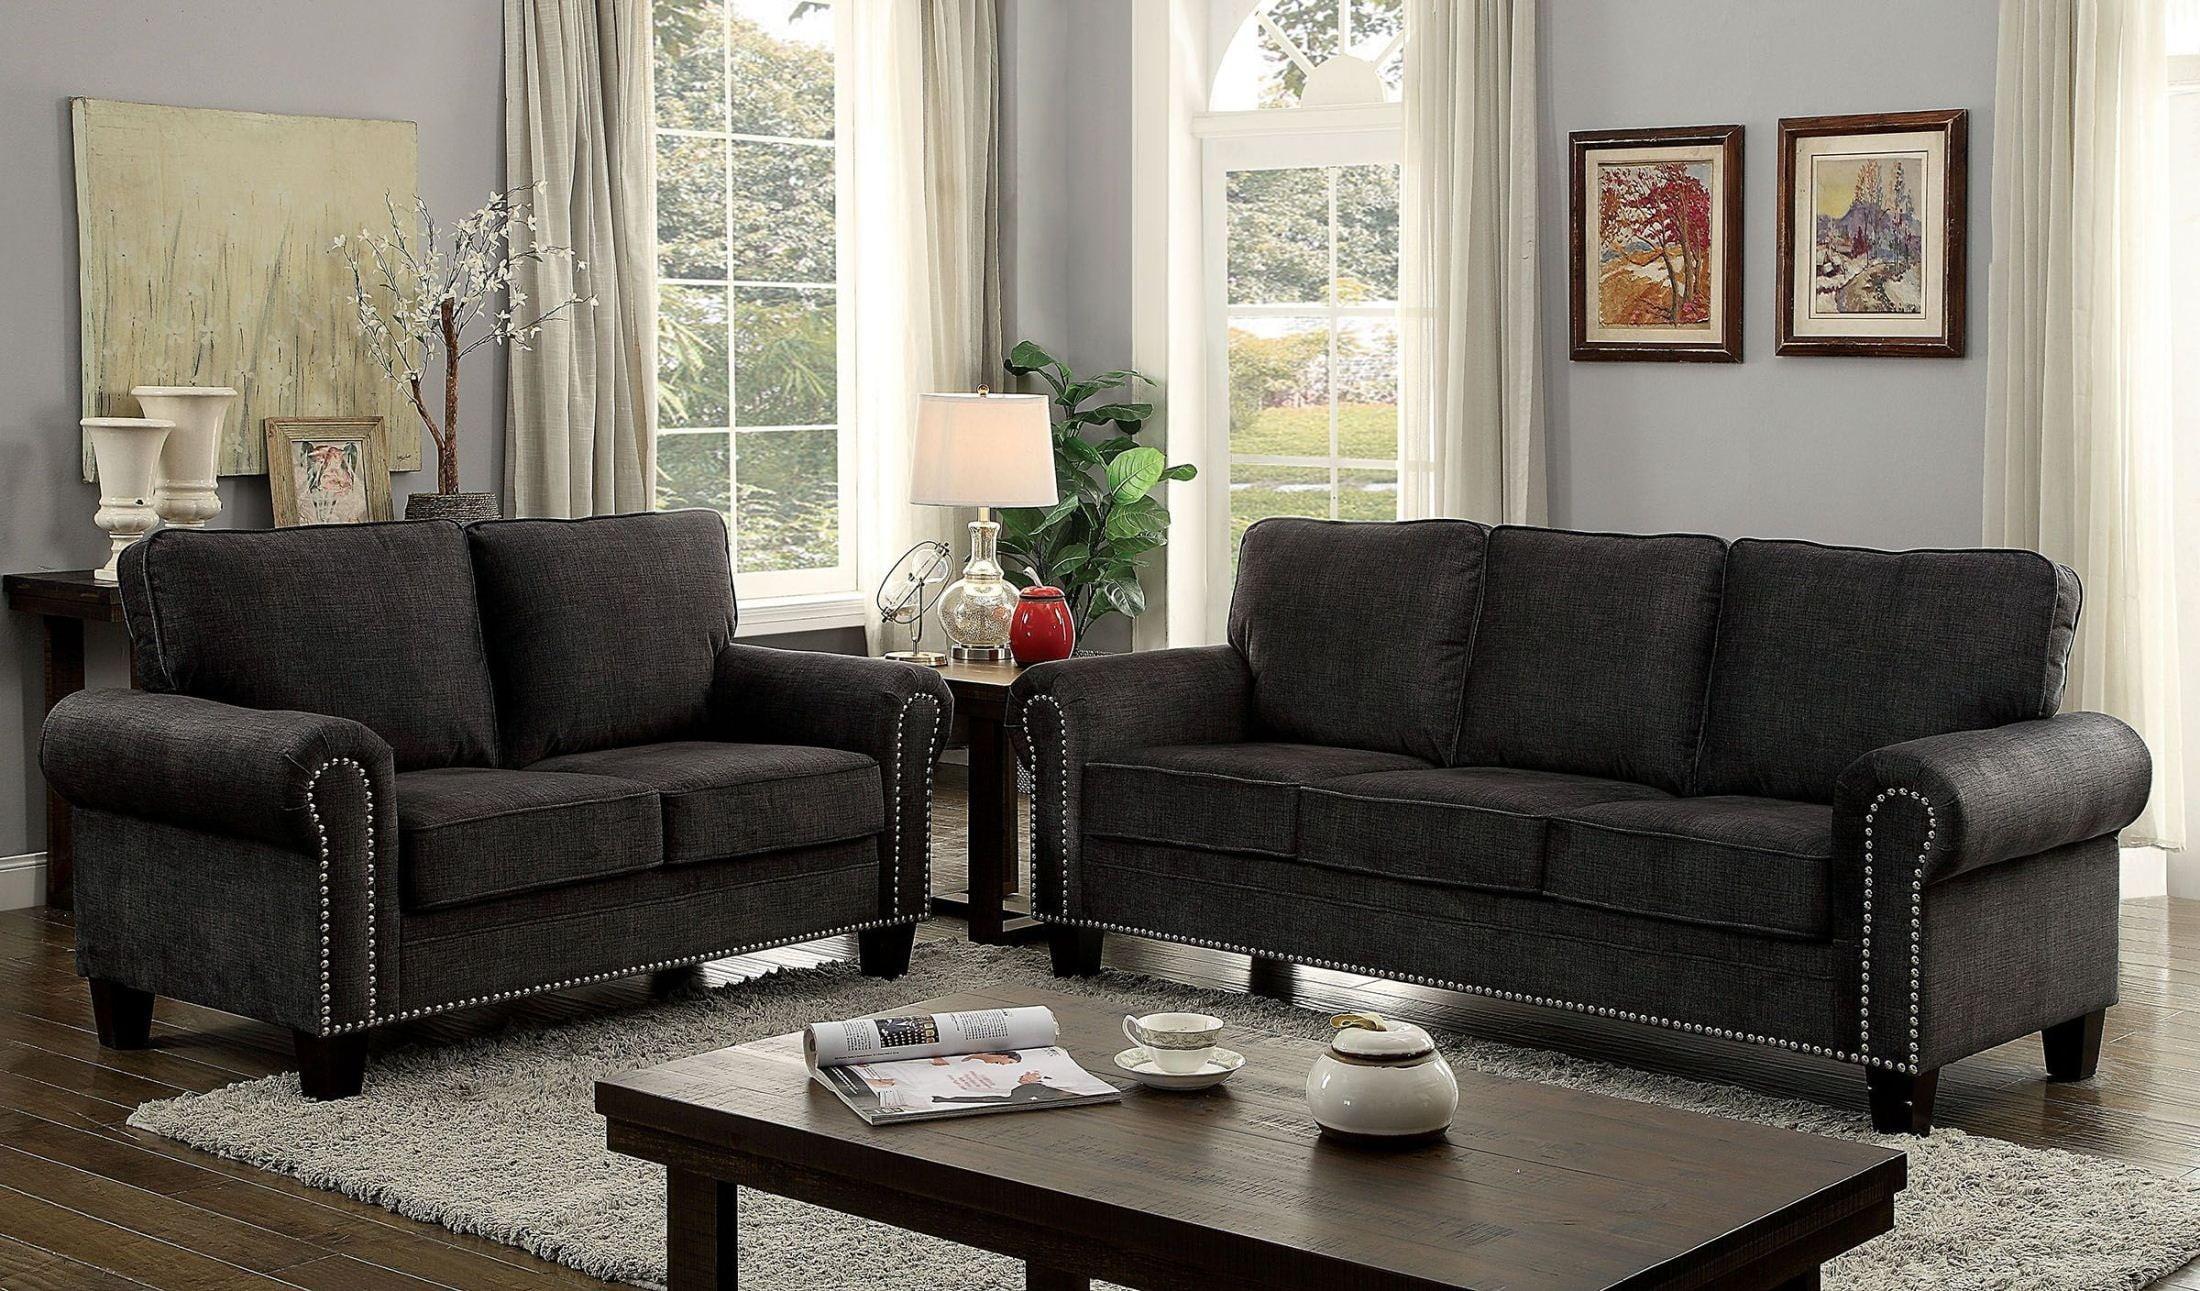 Furniture Of America Elwick Dark Gray Living Room Set